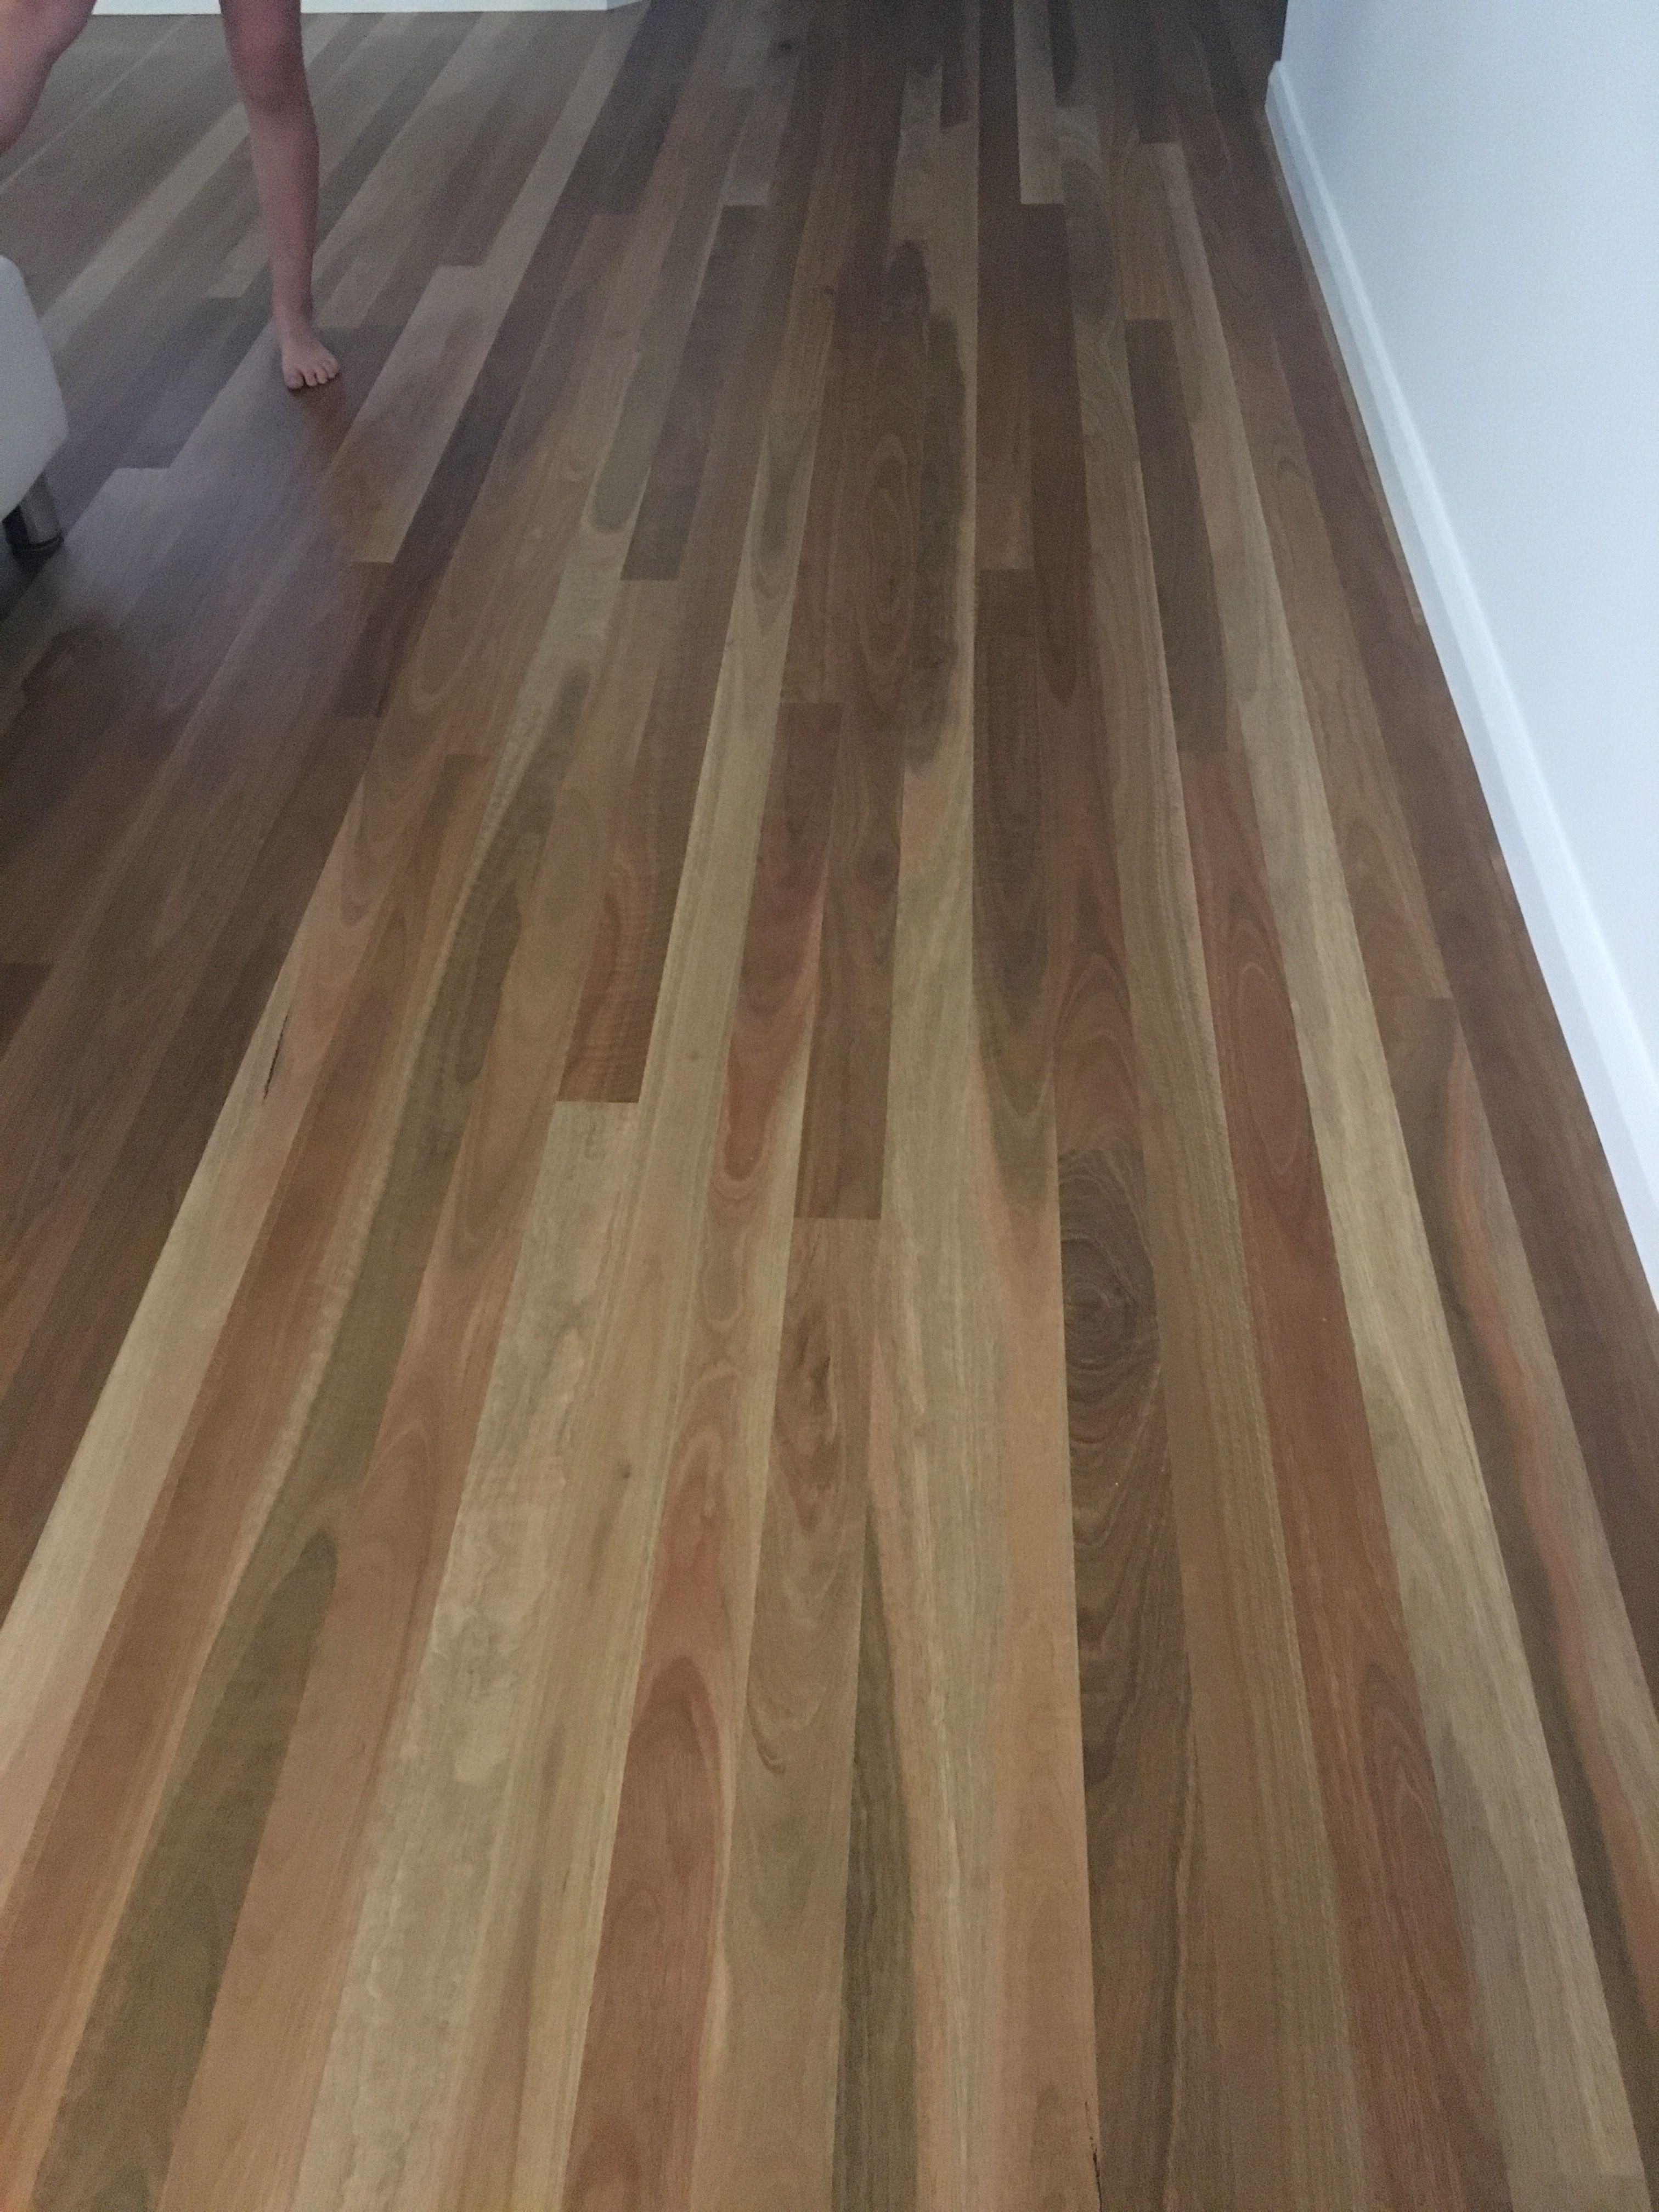 Spotted gum timber floors matt finish | Merewether ...